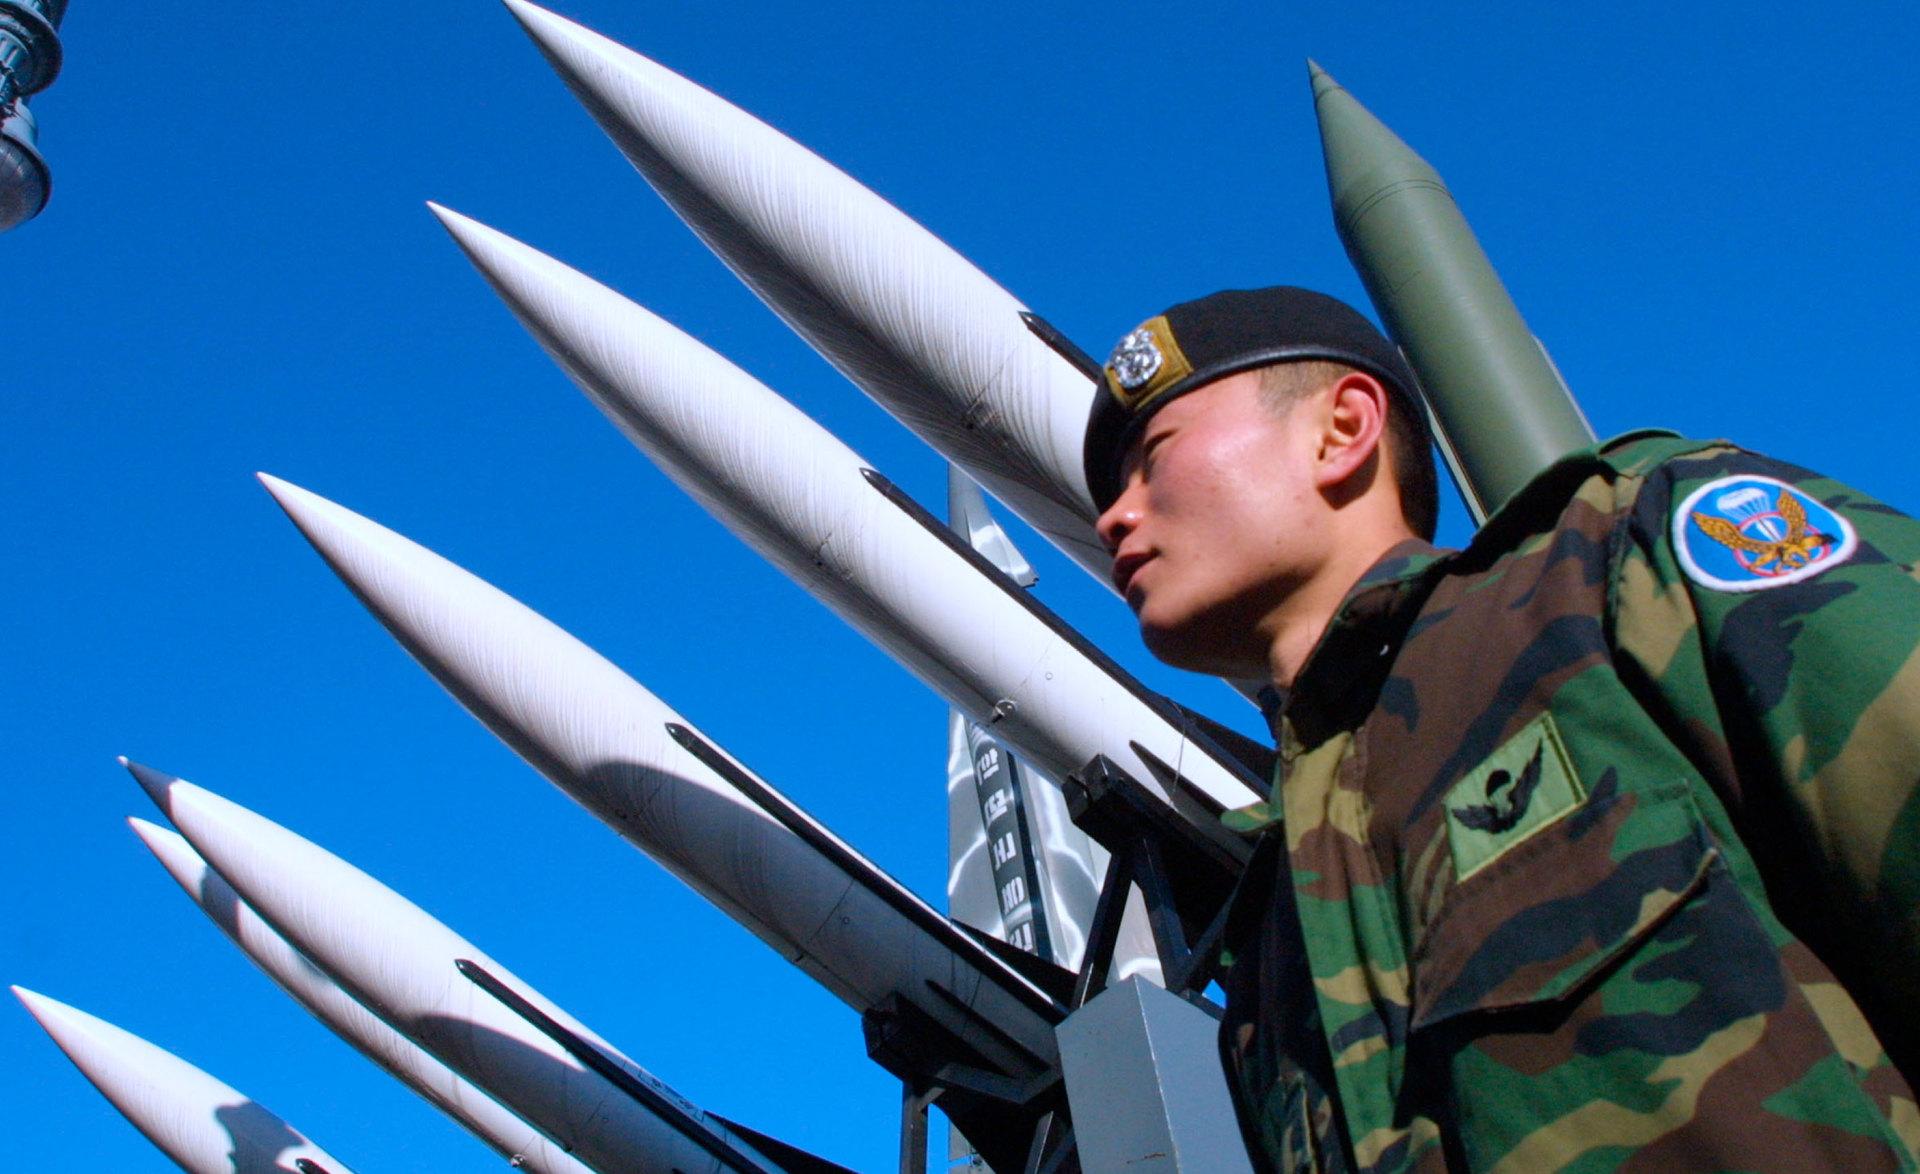 PRIJETNJA 'TOTALNIM RATOM' Južna Koreja u pripravnosti nakon ultimatuma Pjongjanga